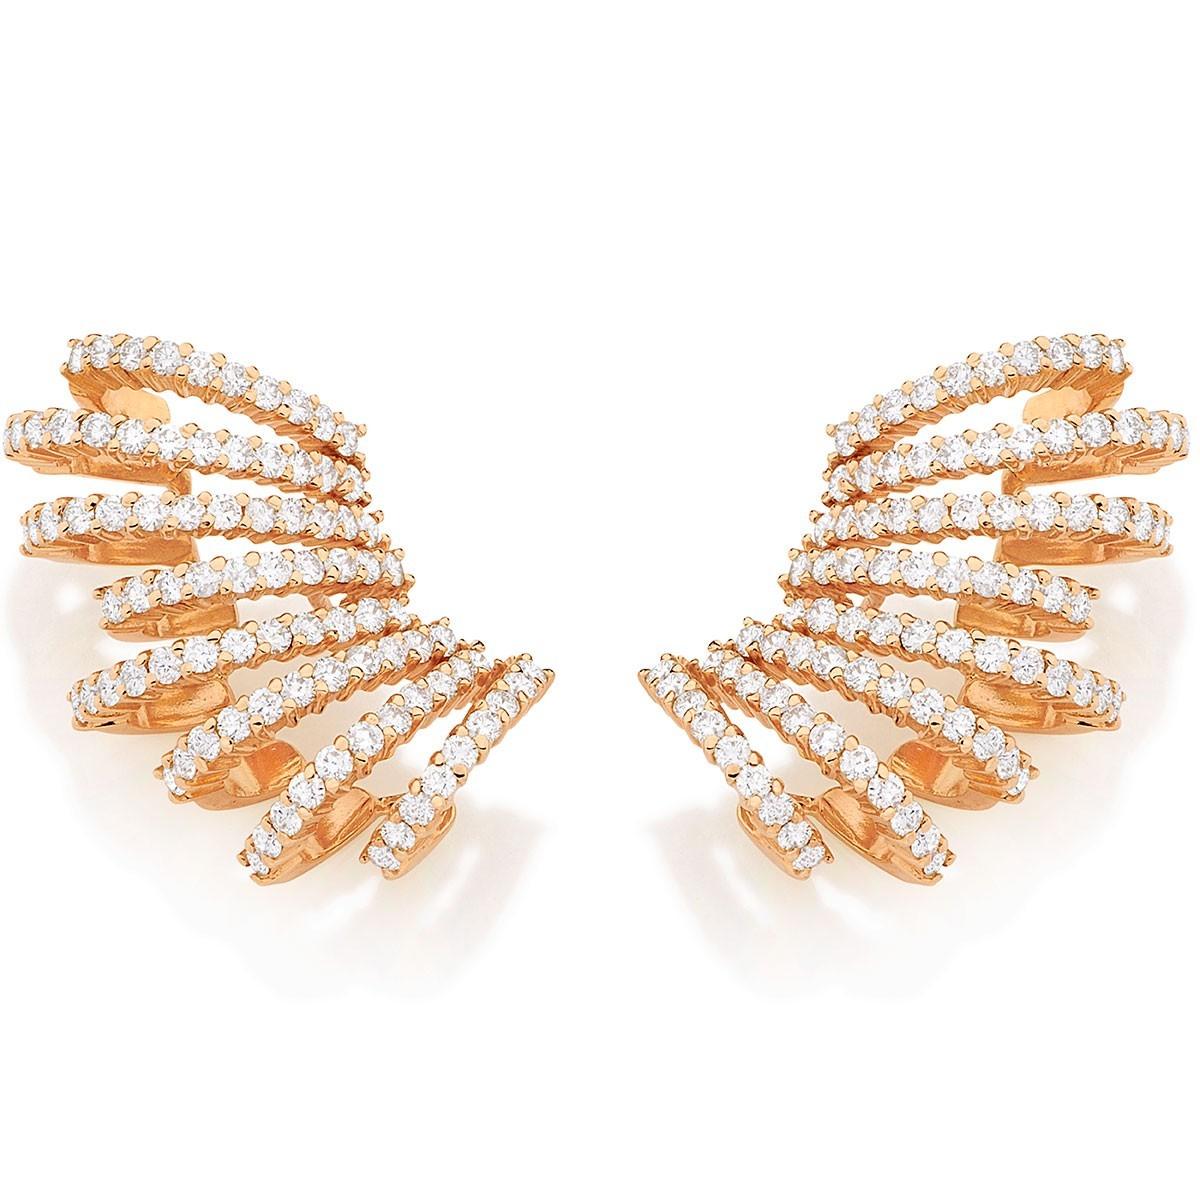 Brinco ear cuff ouro rosa 18K com diamantes 6e78adfff1